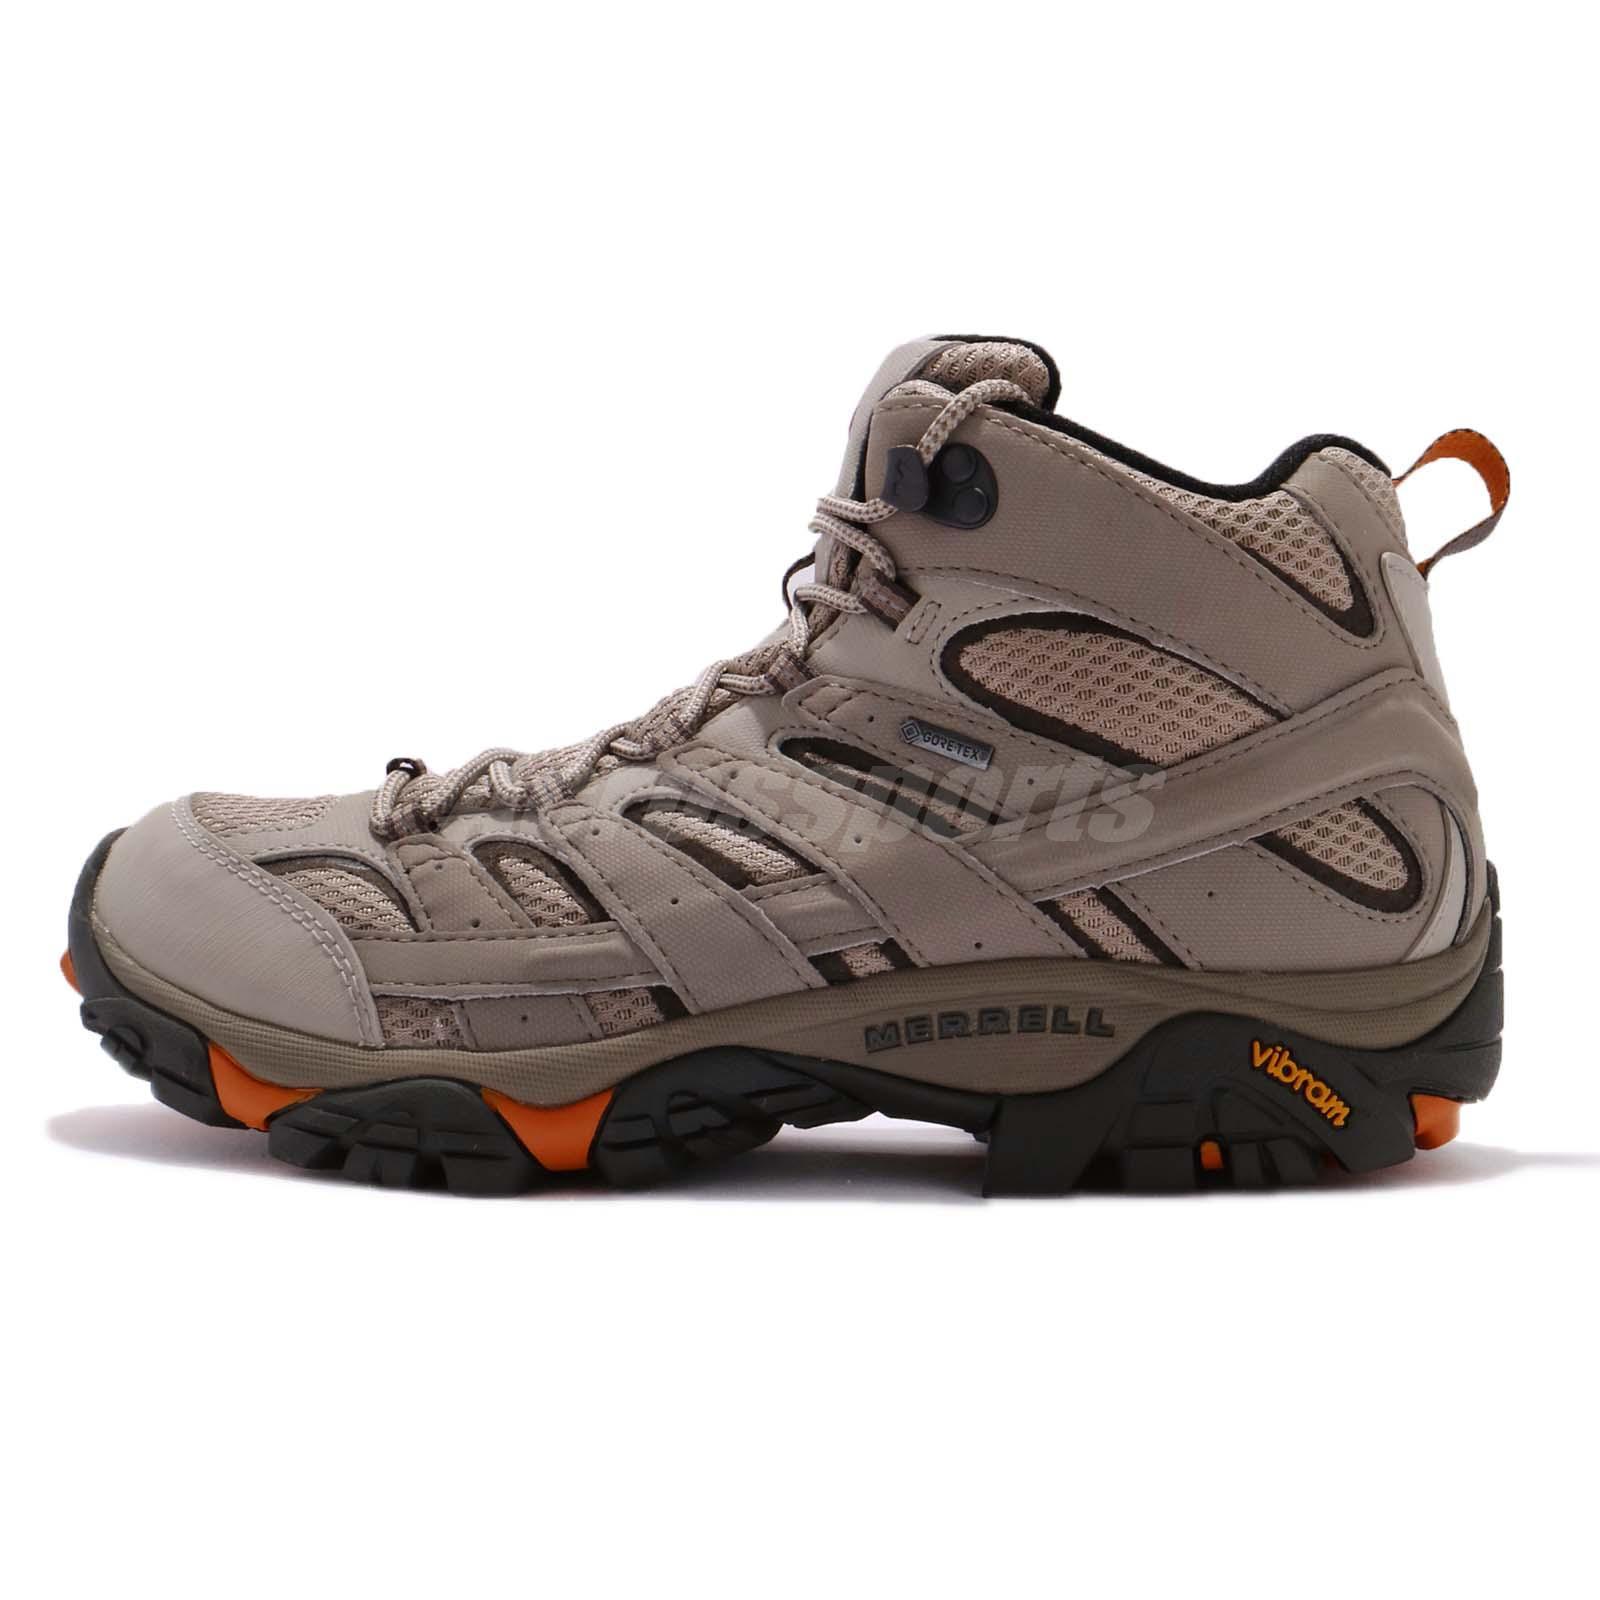 Merrell Shoes Moab 2 Mid GTX J12119 Brindle UK 7 yaF70